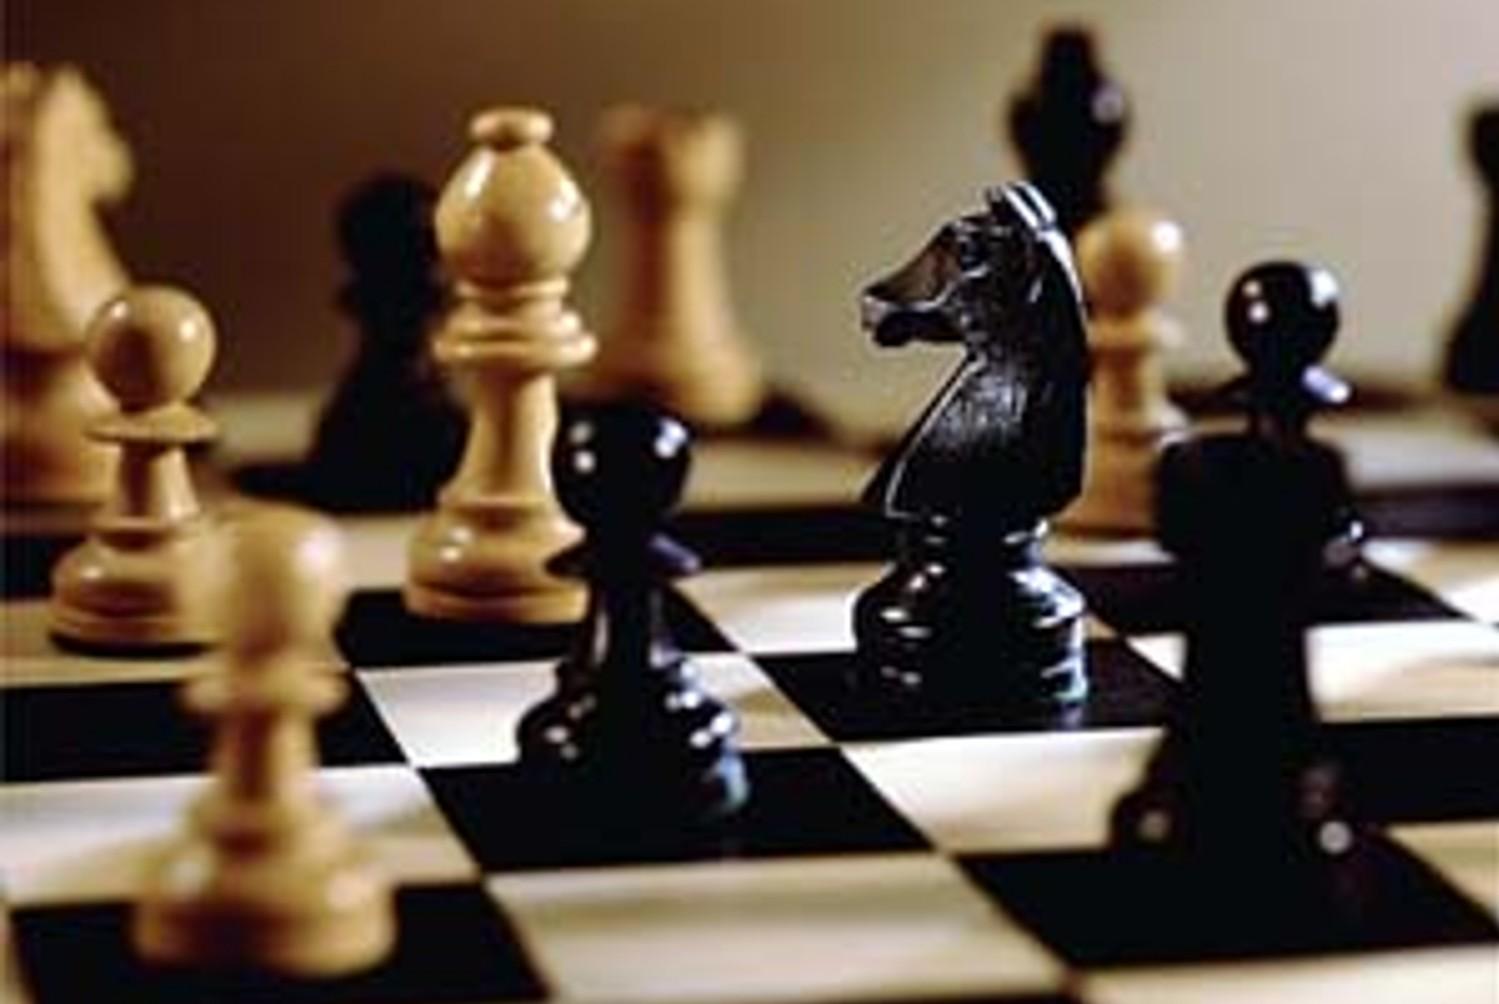 Chess-Set-43-473452